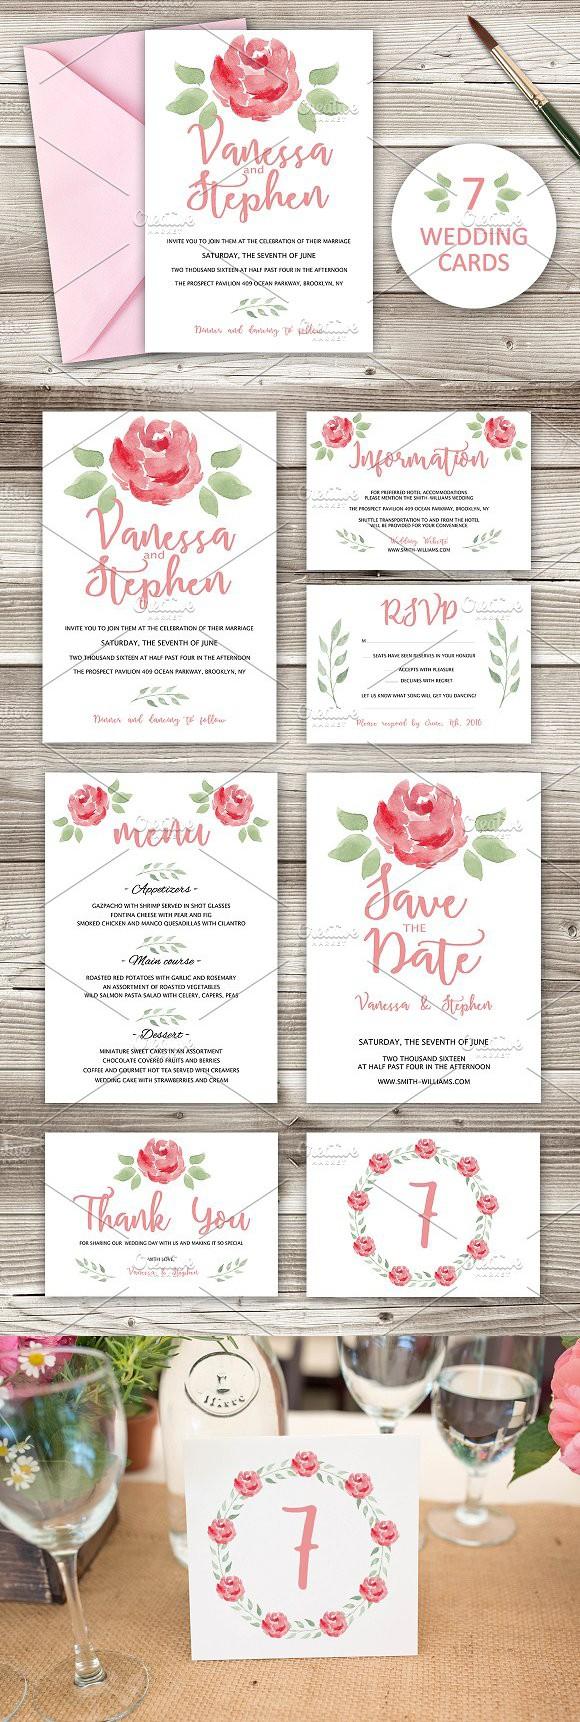 Wedding Invitations Pack 7 cards | Pinterest | Romantic fonts ...